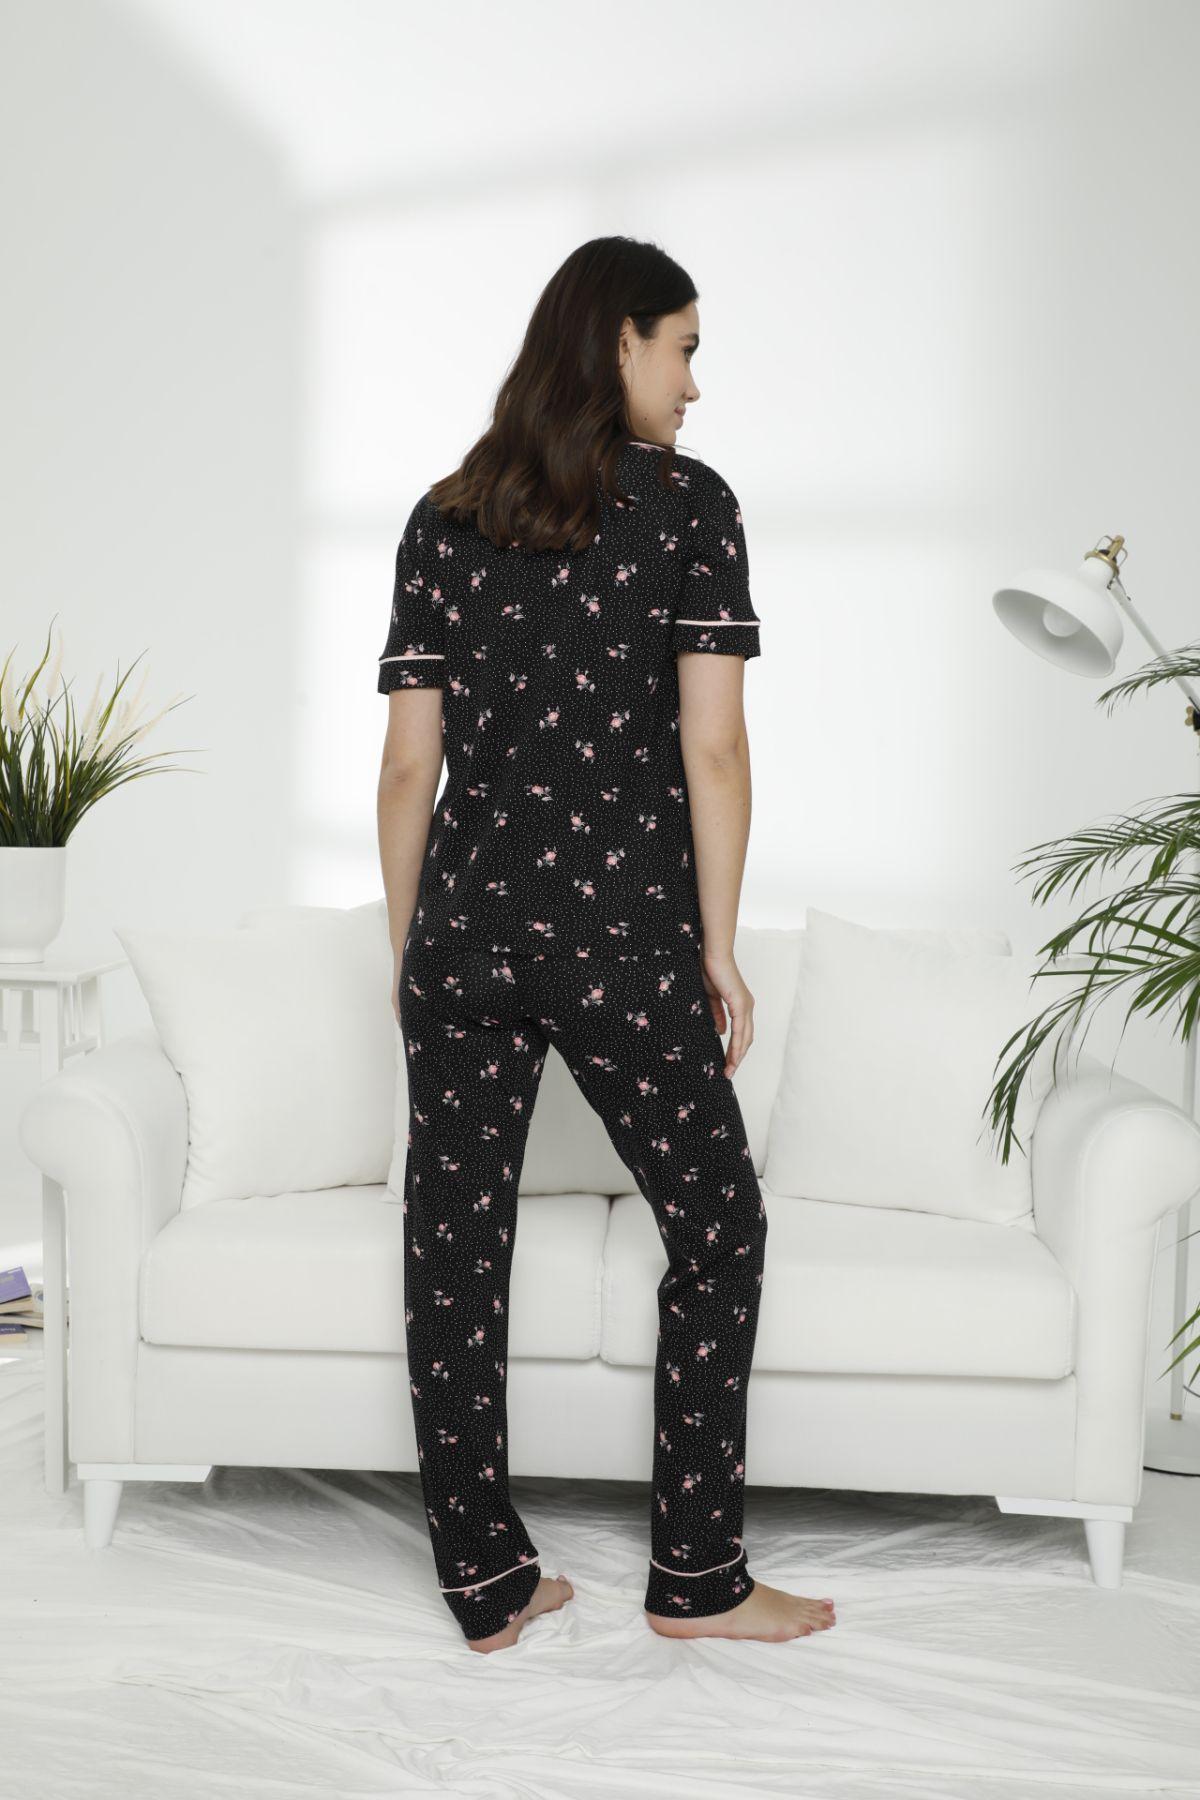 Pamuklu Likralı Düğmeli Pijama Takım 21156561